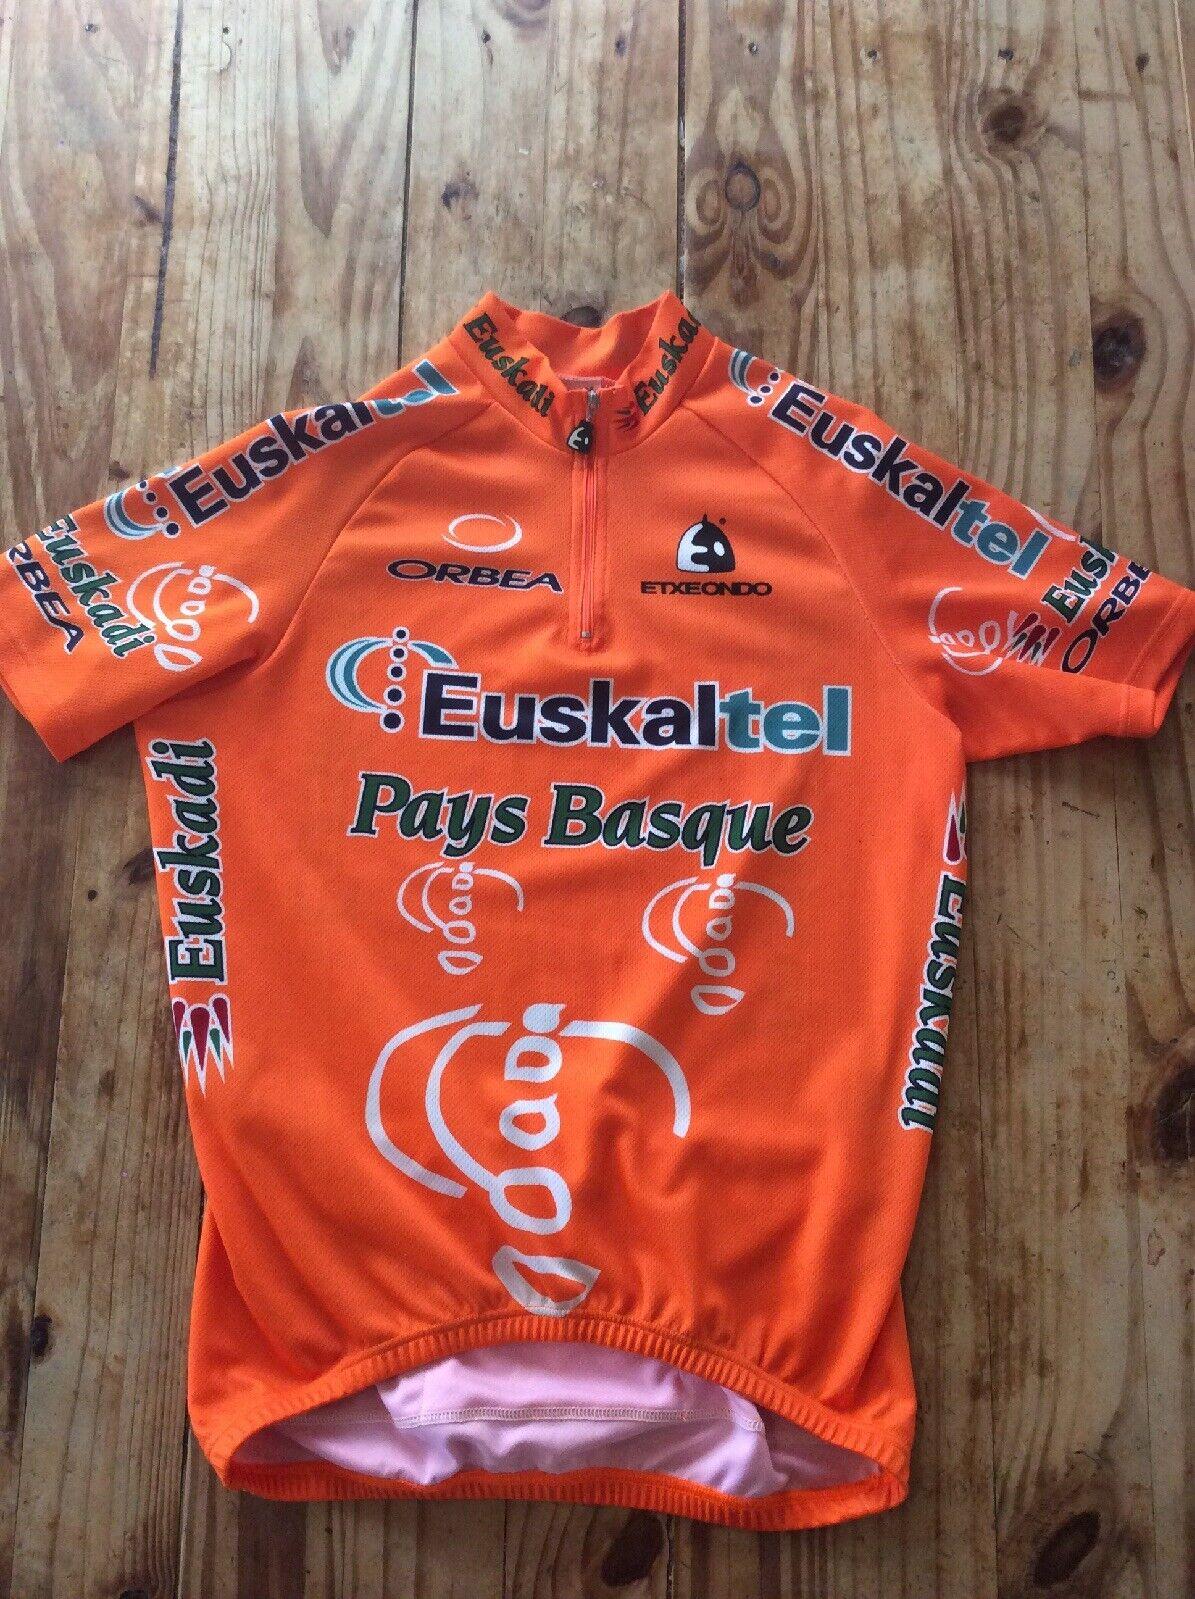 ETXEONDO Euskaltel Euskadi spanish Cycling Jersey Lg 1 4 Zip orange Short Sleeve